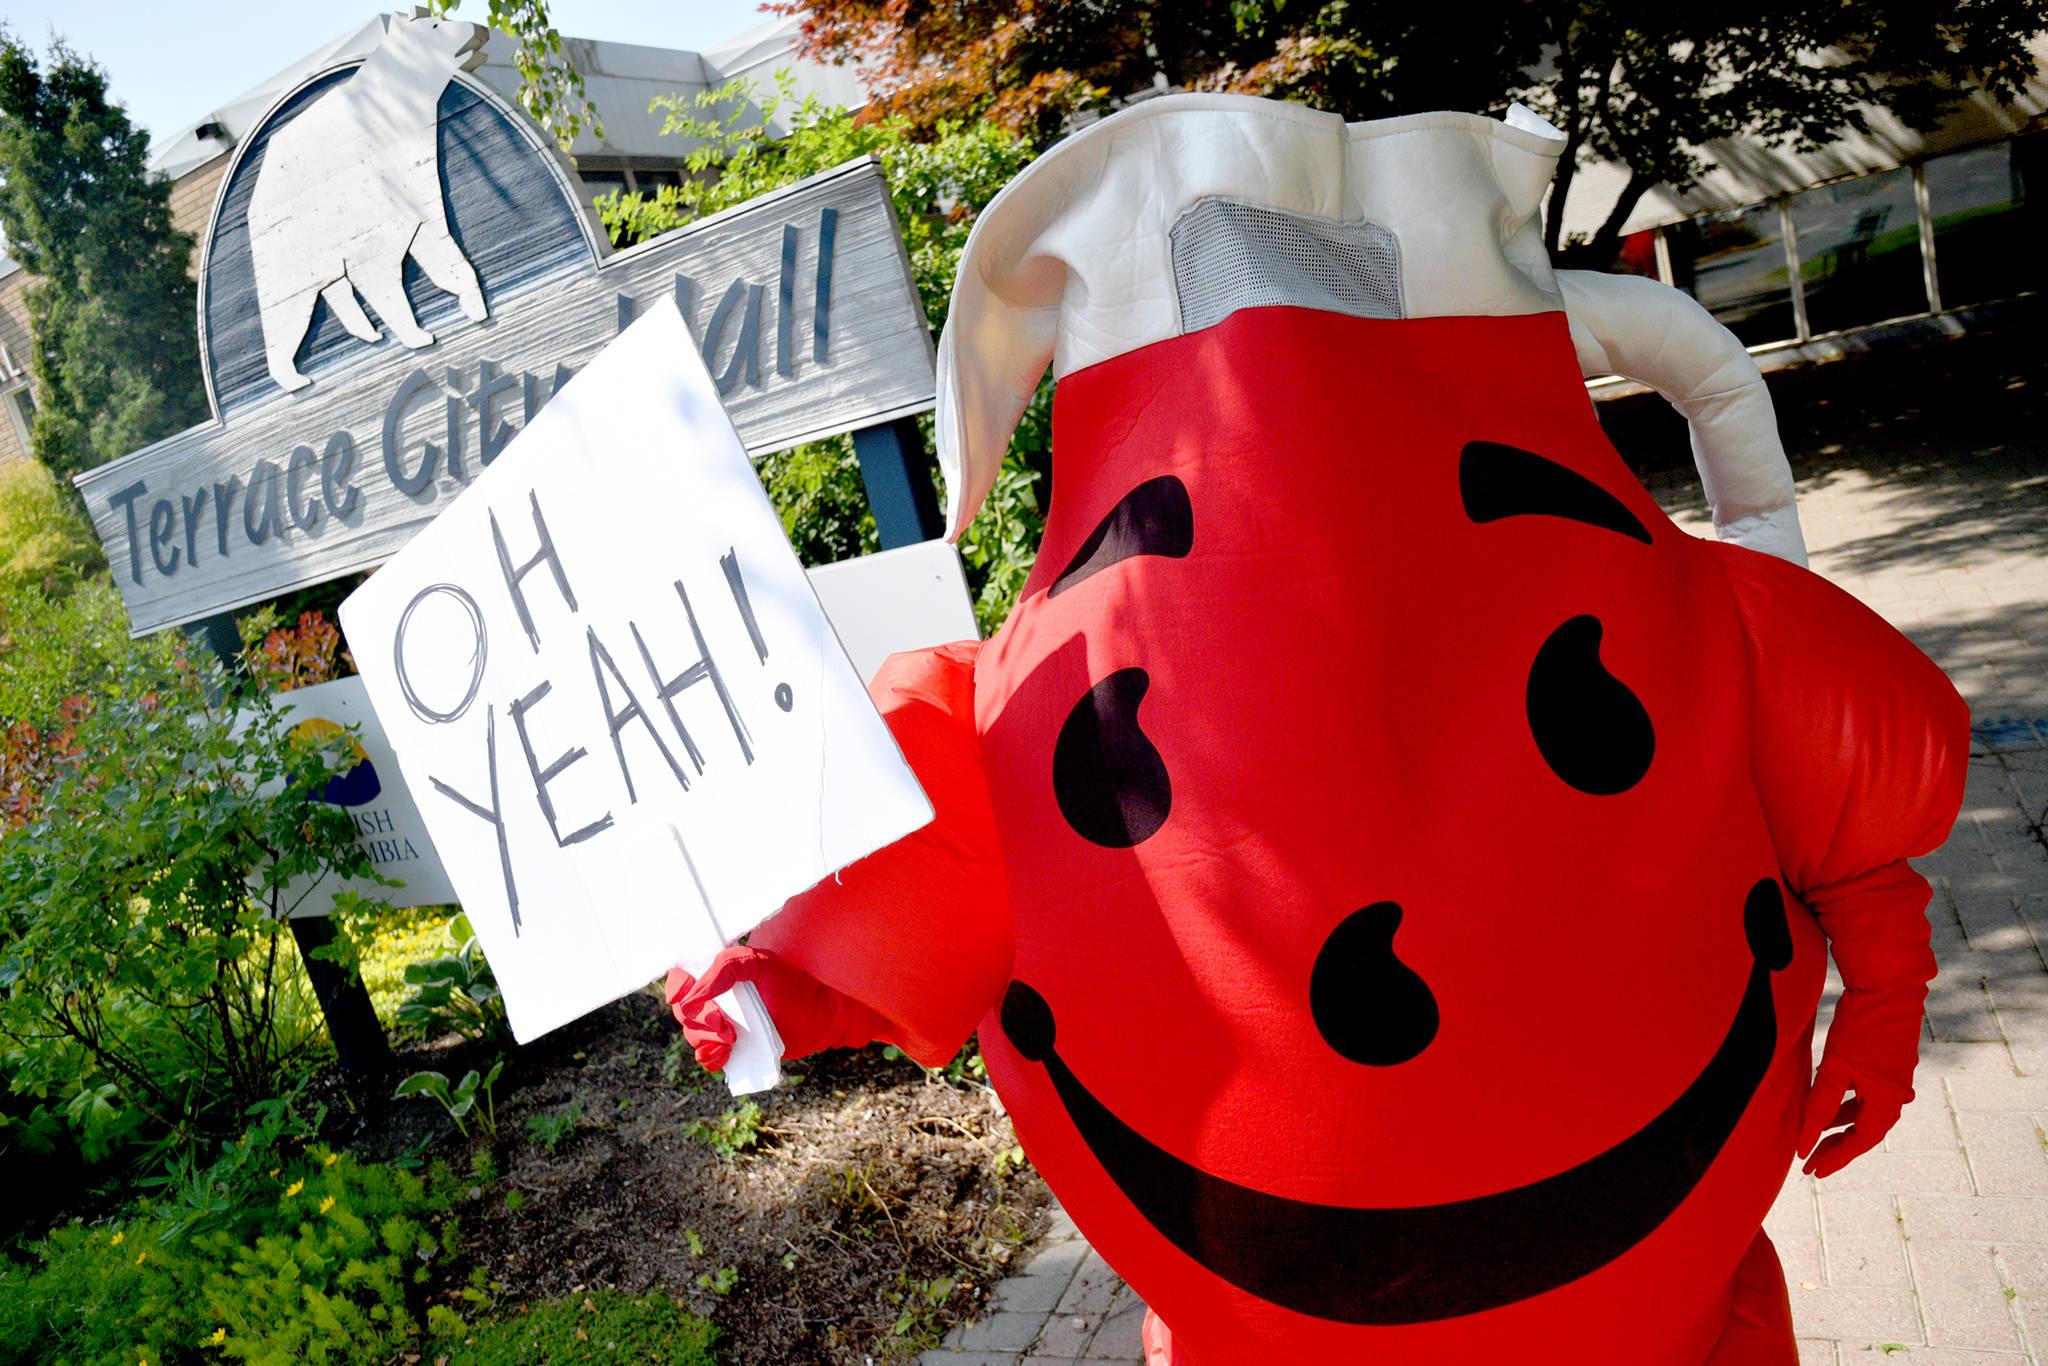 Kool-Aid man to run for mayor of B.C. town